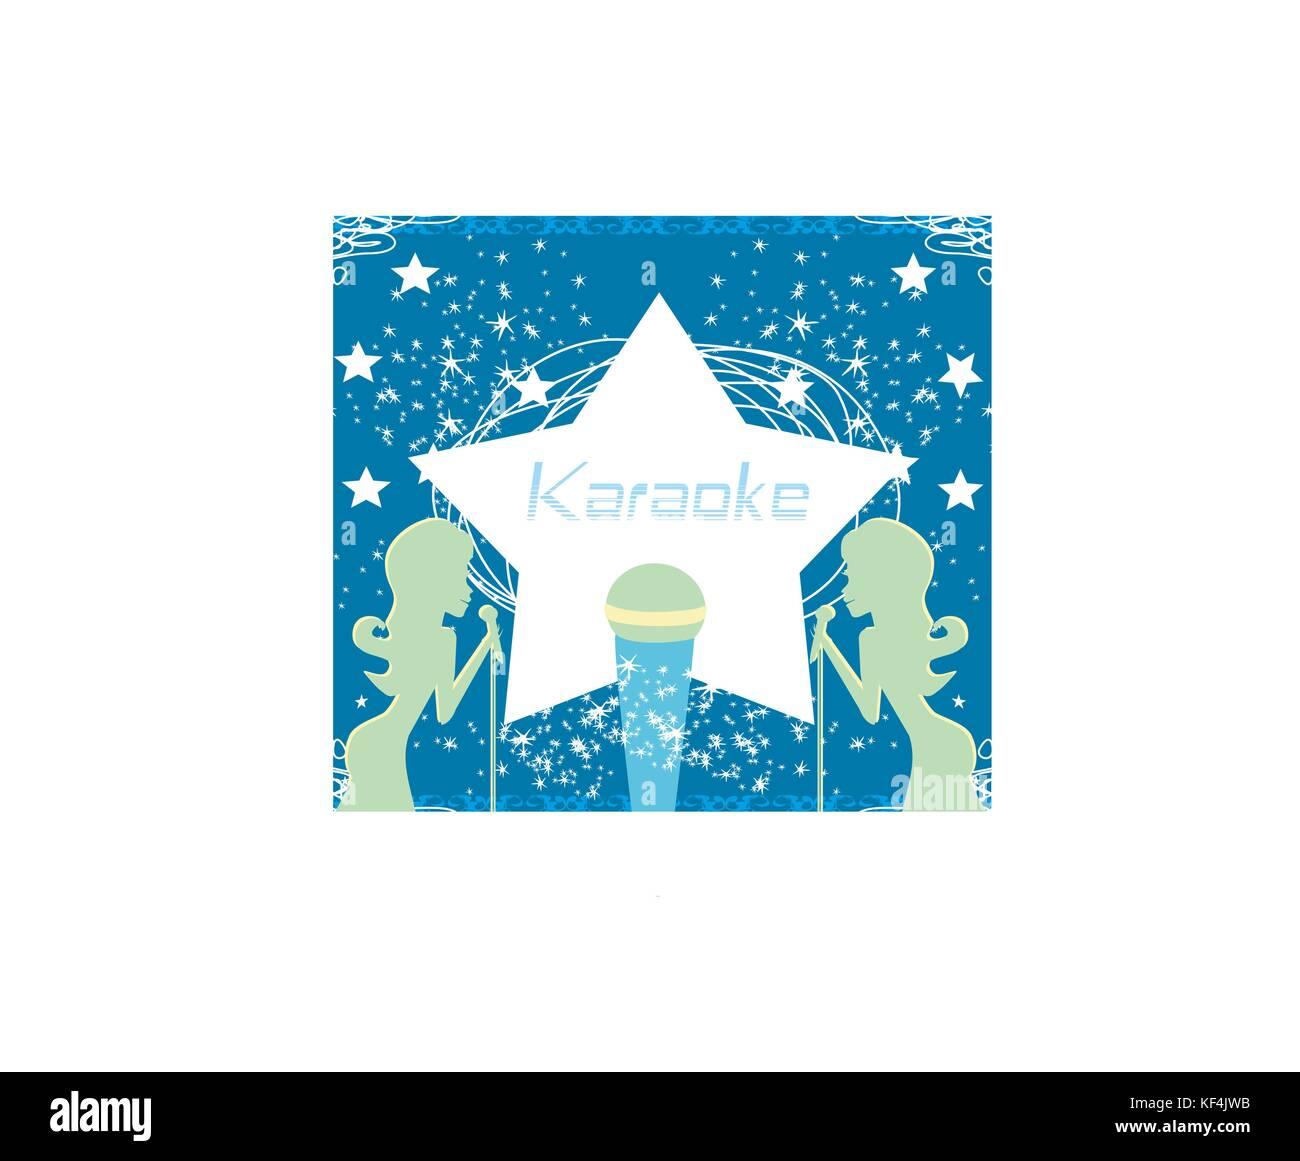 Karaoke Party Invitation Poster Design Template Stock Vector Art